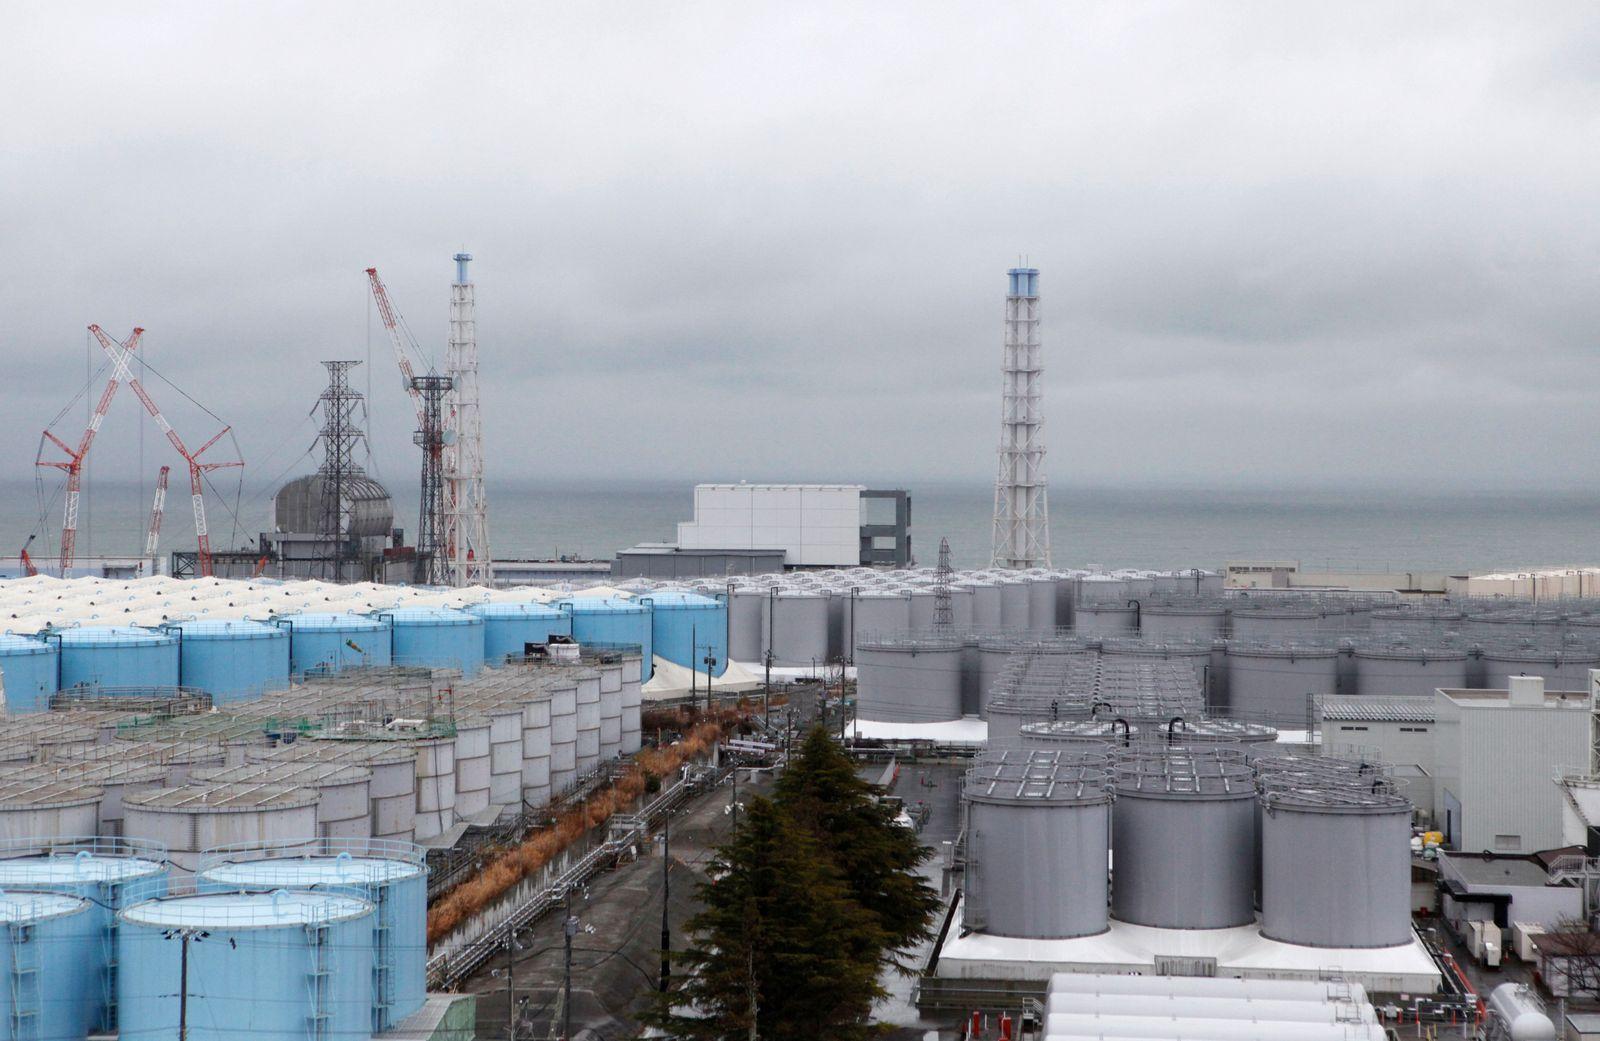 FILE PHOTO: Storage tanks for radioactive water are seen at tsunami-crippled Fukushima Daiichi nuclear power plant in Okuma town, Fukushima prefecture, Japan